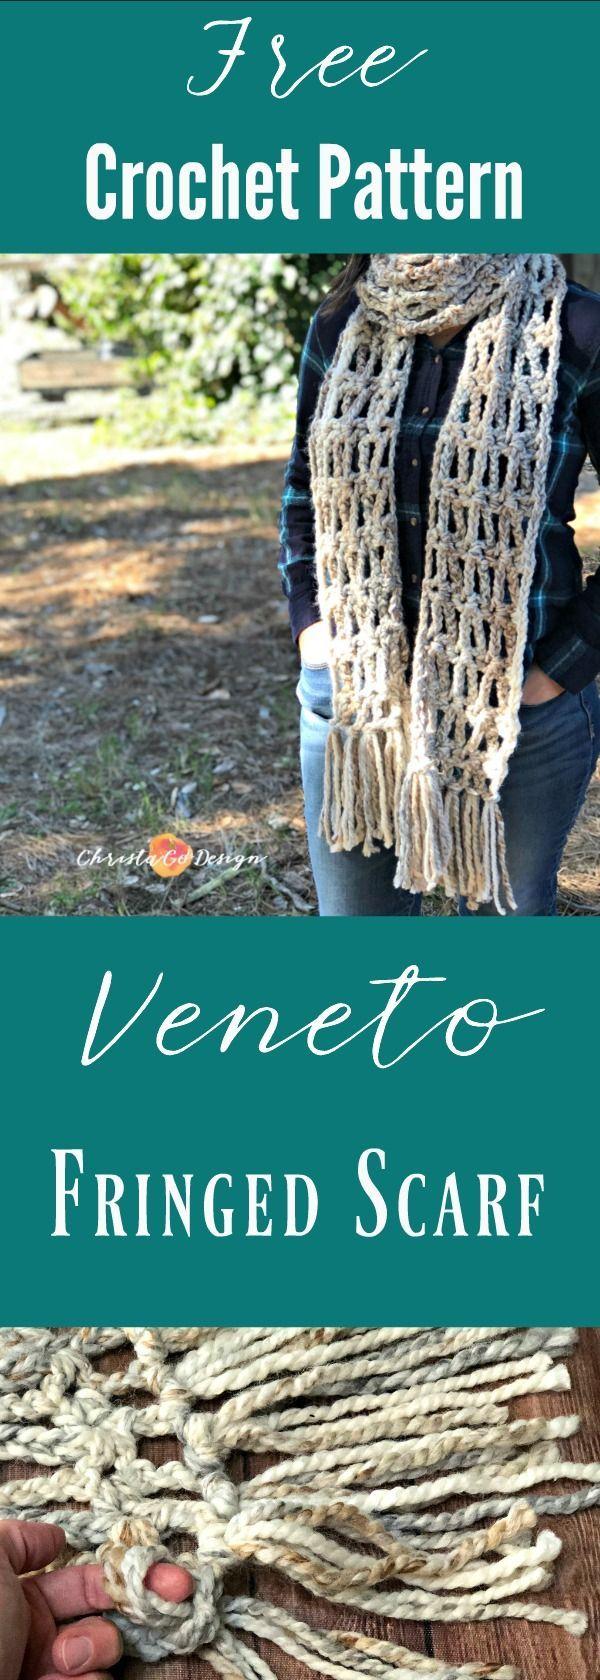 392 best Crochet Scarf Patterns images on Pinterest | Coats, Craft ...